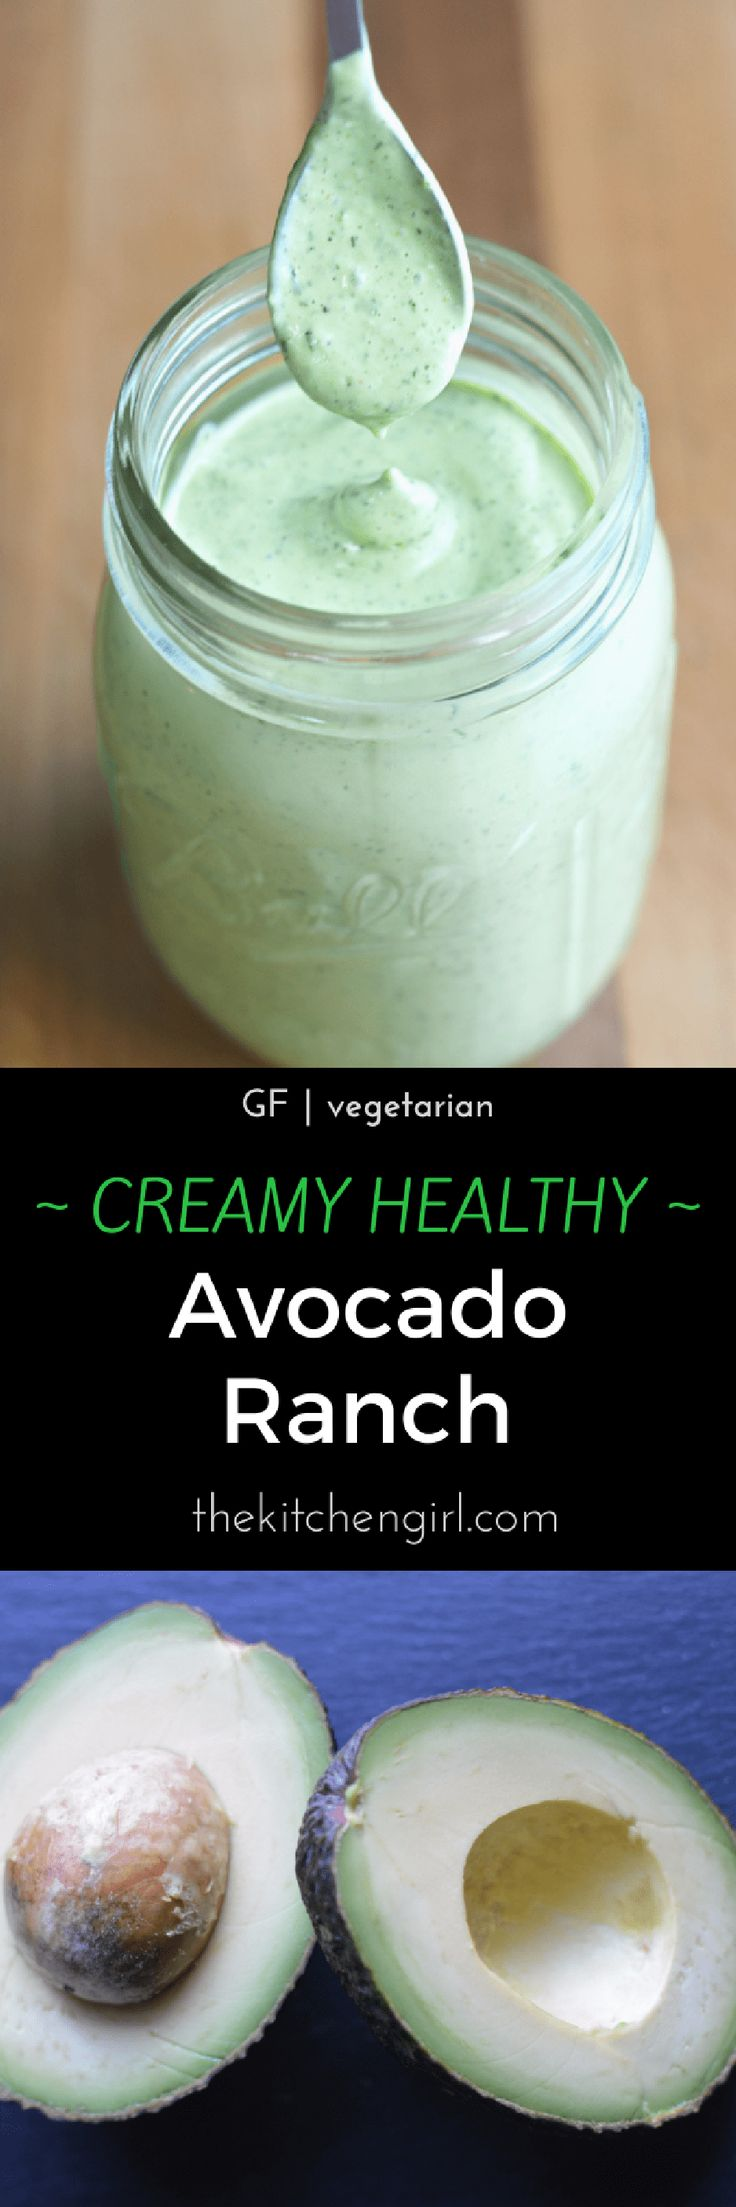 SO addictive & secretly healthy! Creamy Avocado Ranch Dressing uses nonfat Greek yogurt and less mayo than most ranch recipes. GF / Vegetarian. thekitchengirl.com #healthyranch #greekyogurtranch #healthyappetizer #ranchdip #partyfood